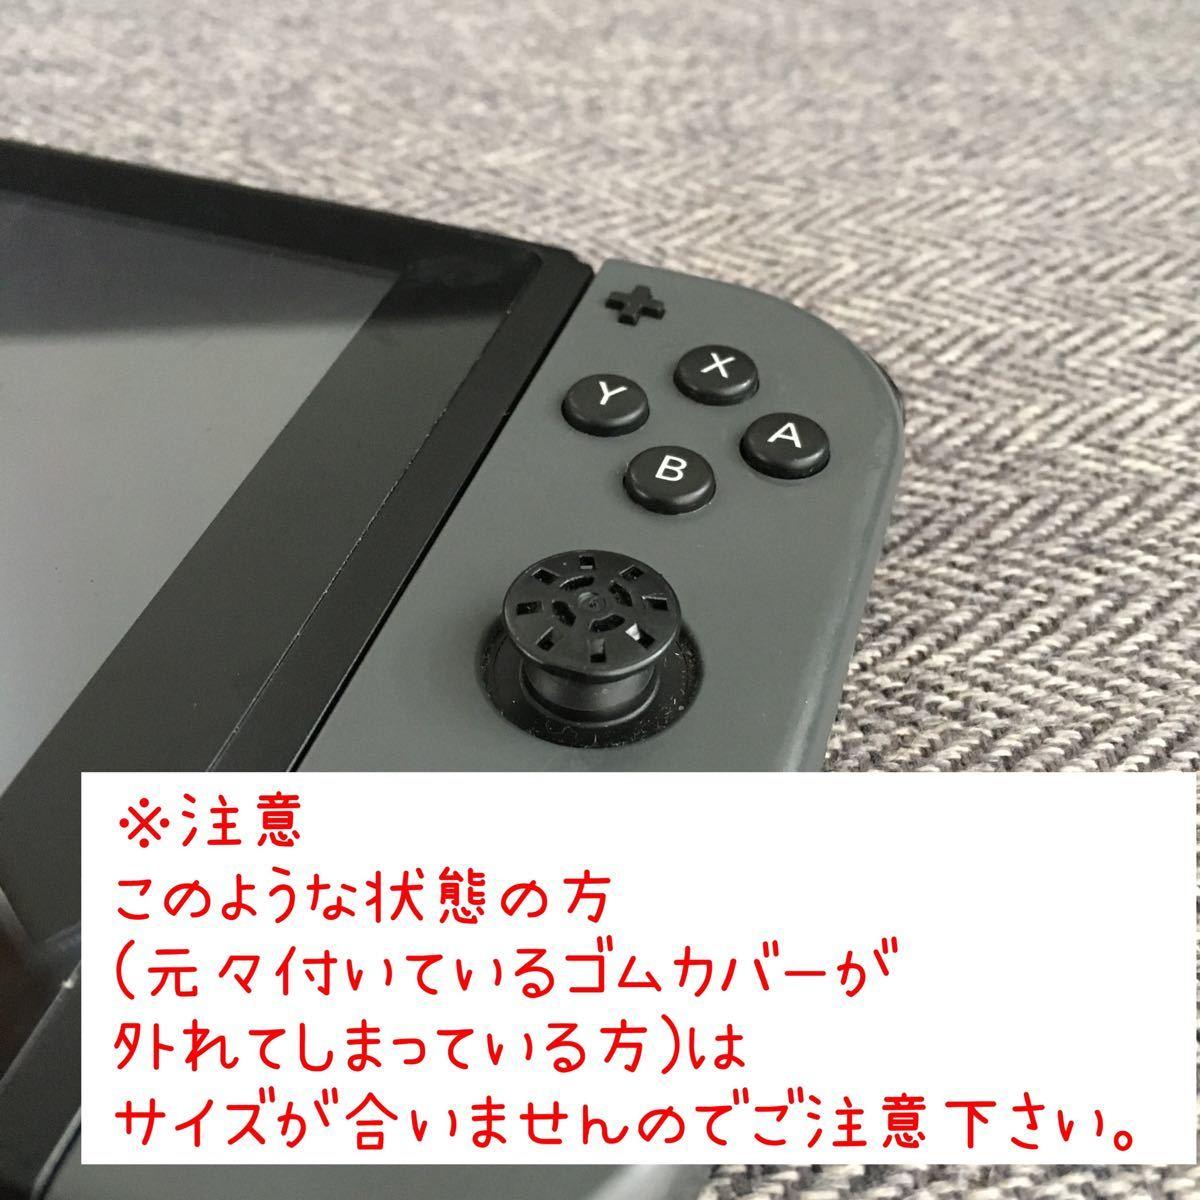 Switch スイッチ ジョイコン スティックカバー 肉球 2個【緑白】